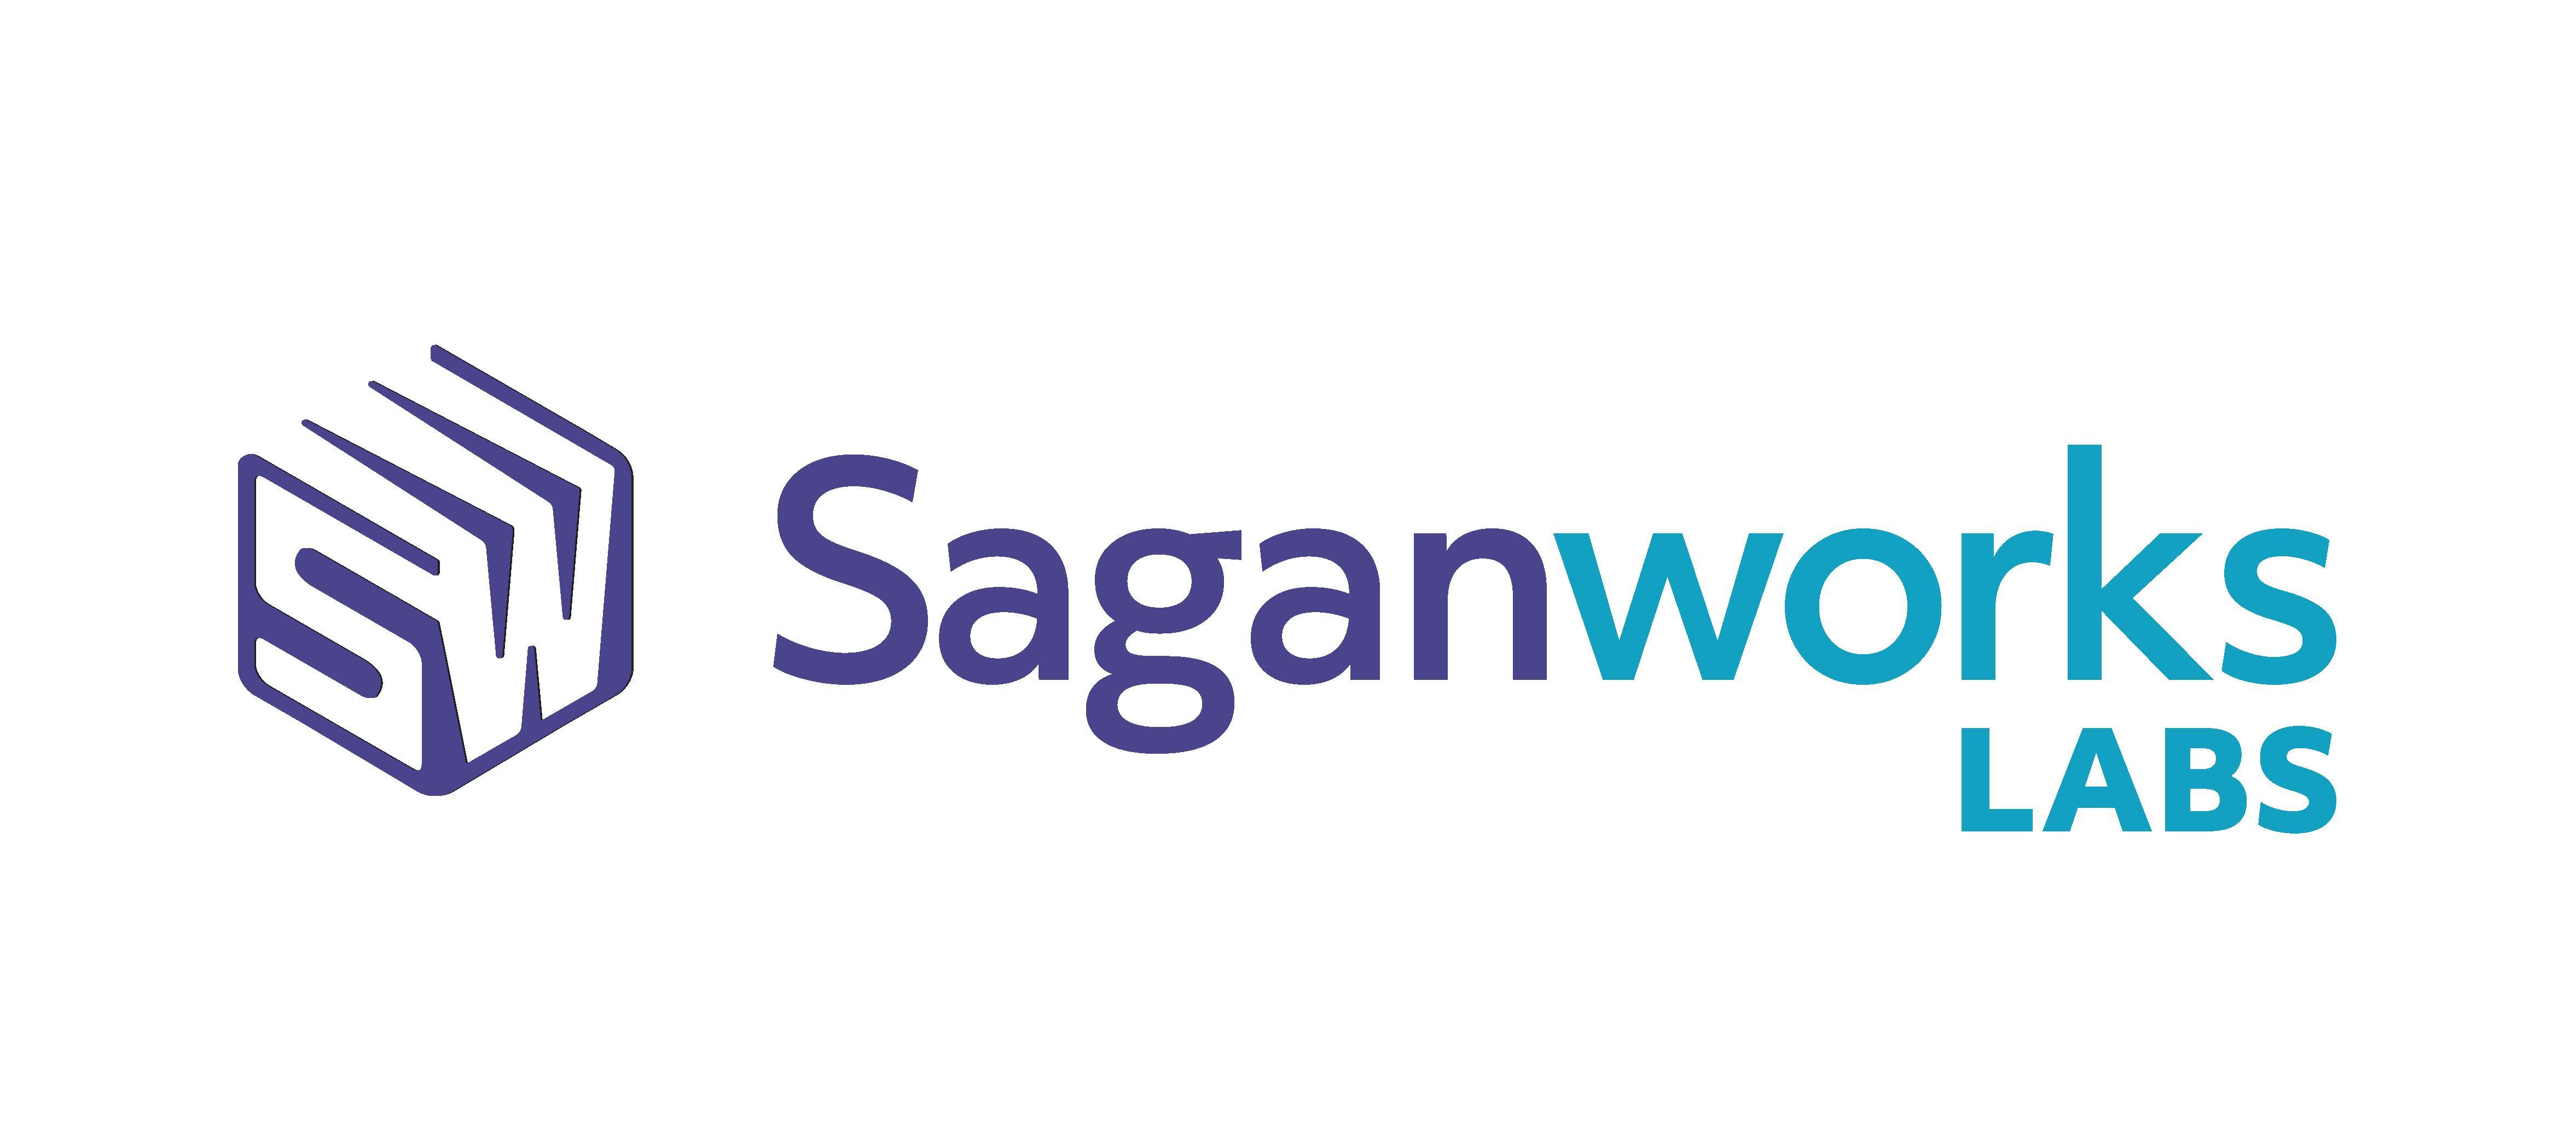 Saganworks Labs Logo